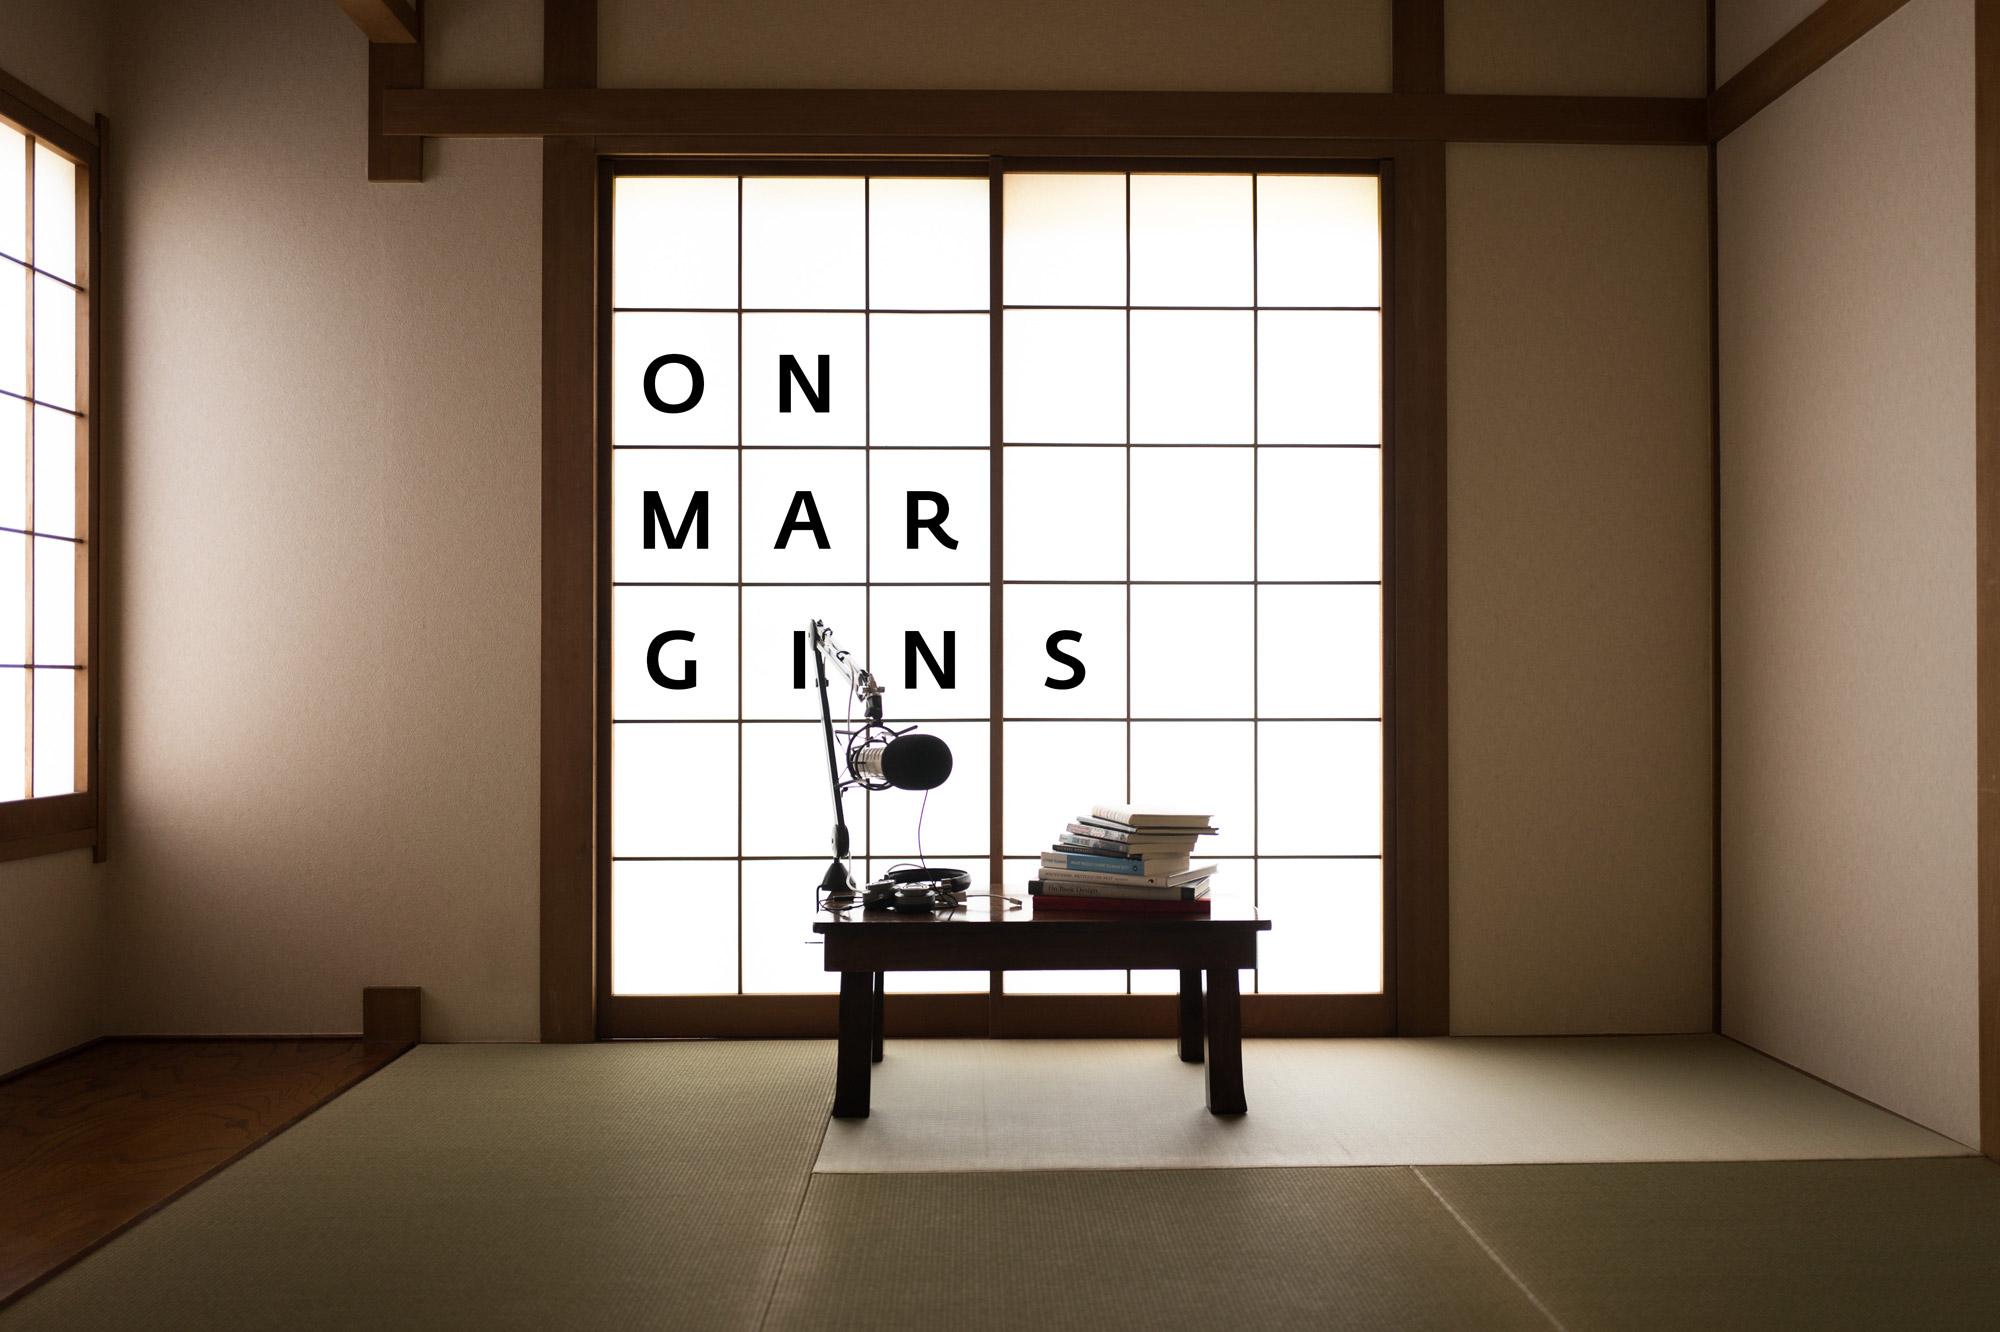 A Japanese room, tatami, shoji, a chbudai, a microphone, a stack of books